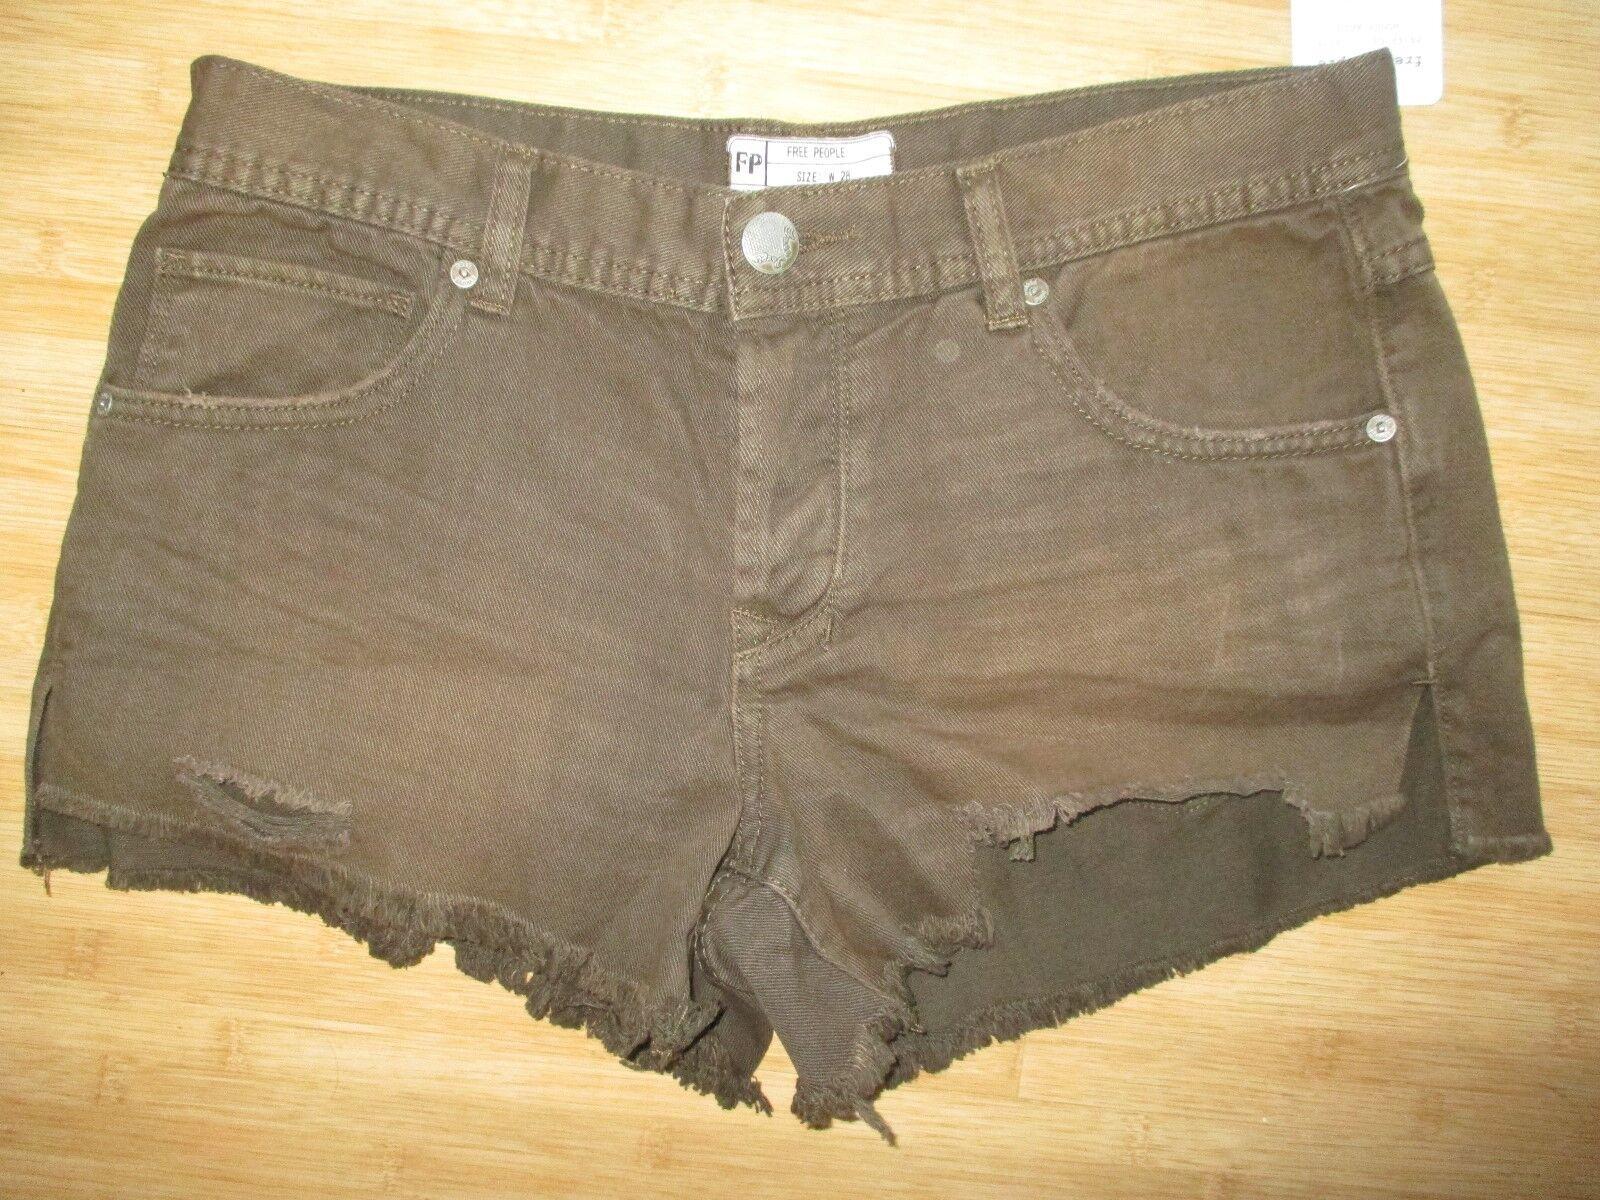 NWT Free People LADIES 28 JEAN DENIM Shorts PANTS Distressed Cut Offs Brown